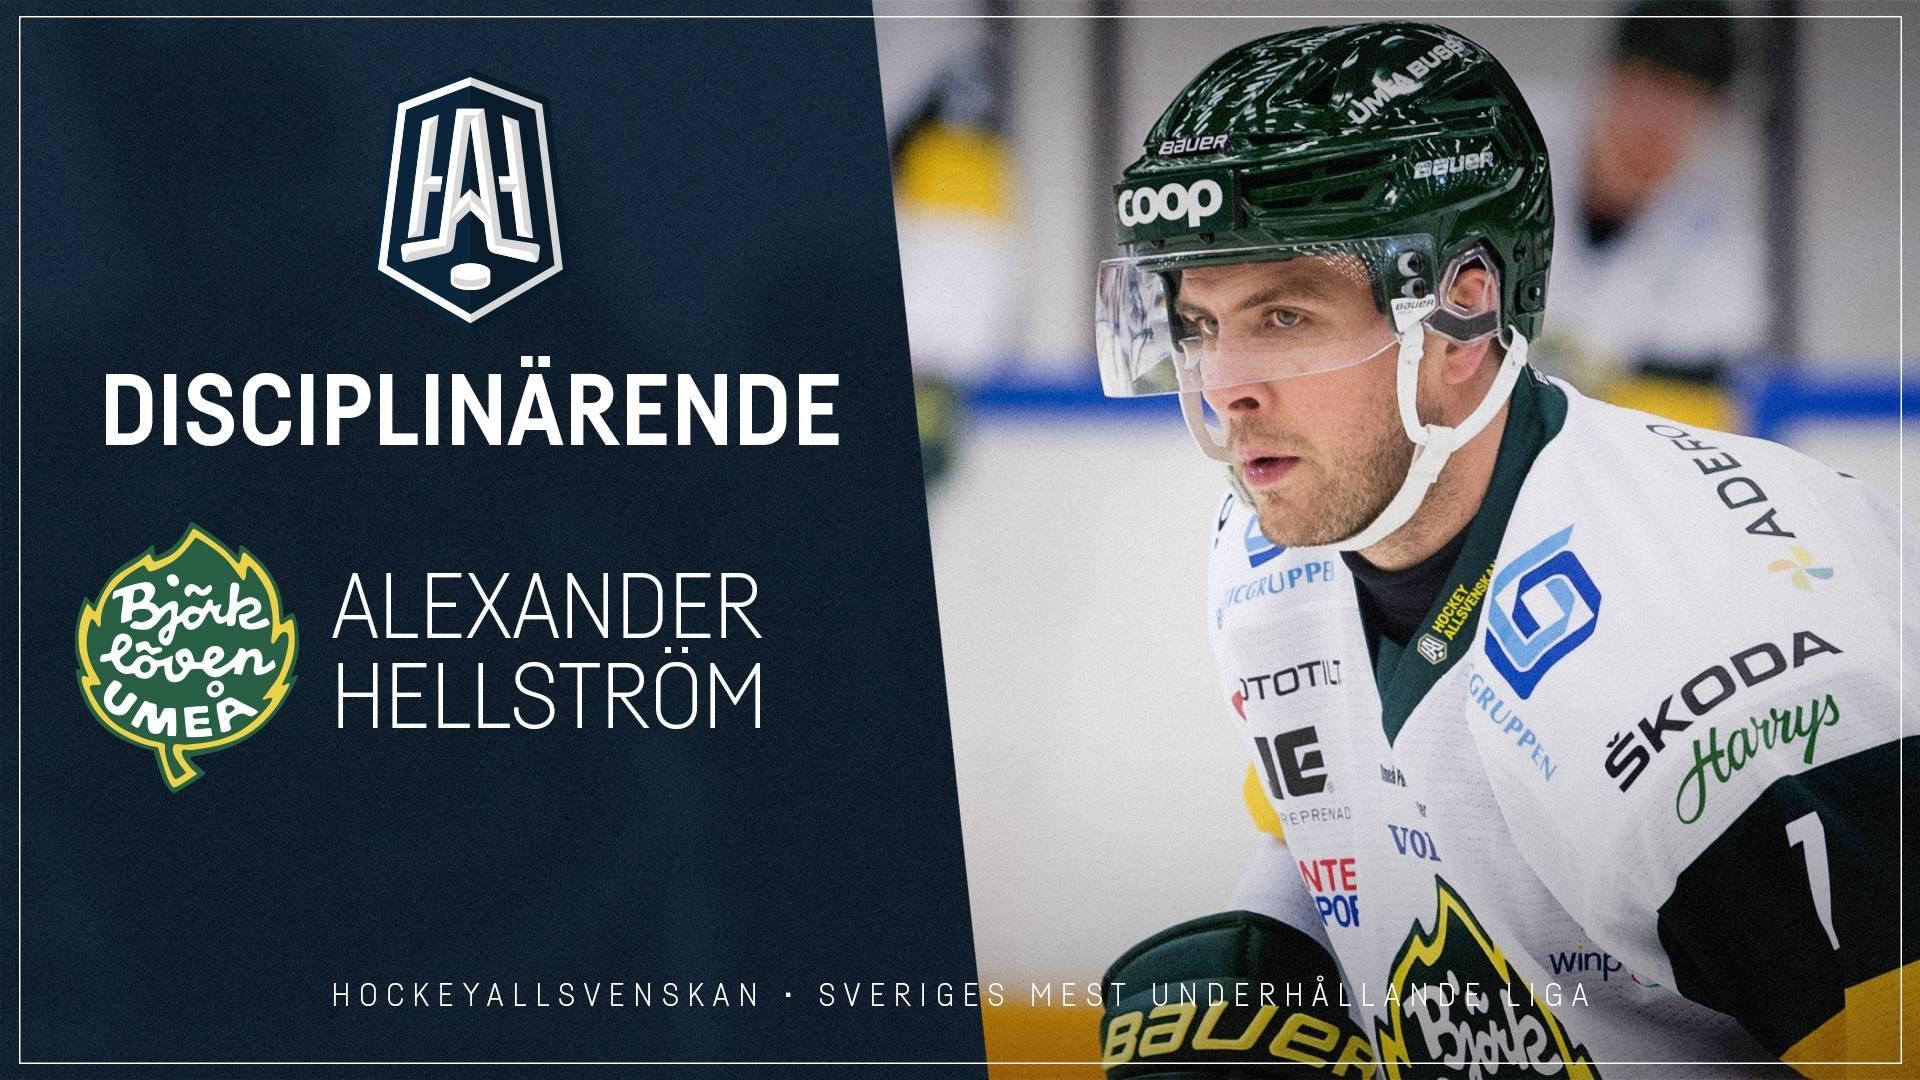 Disciplinärende: Alexander Hellström, Björklöven